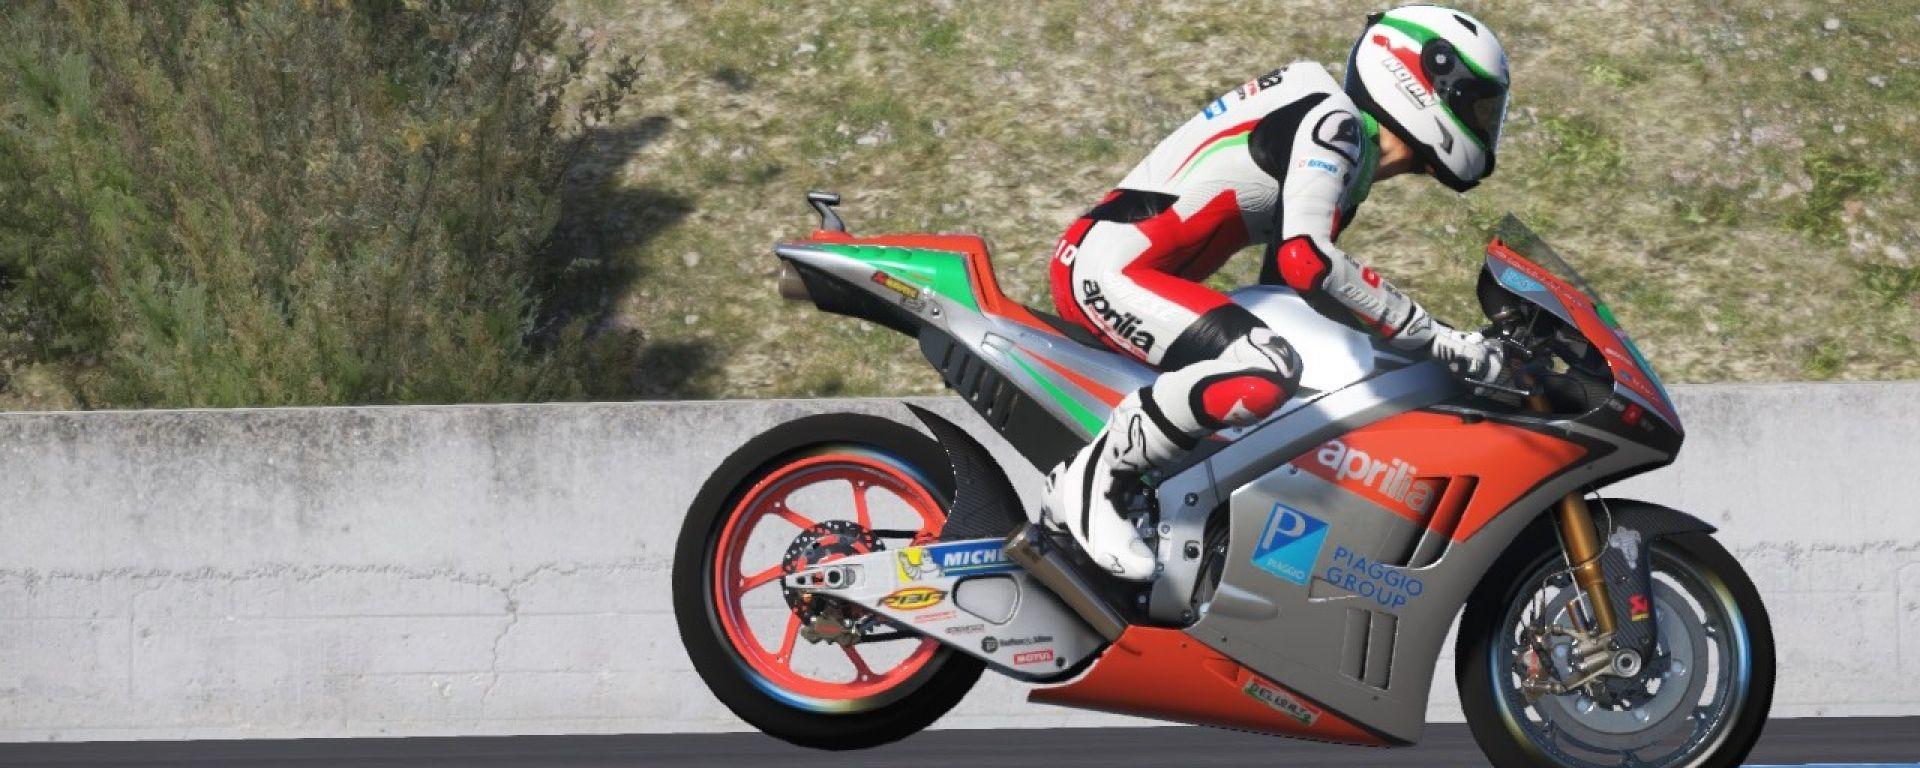 MotorBox On Track - Jerez de la Frontera